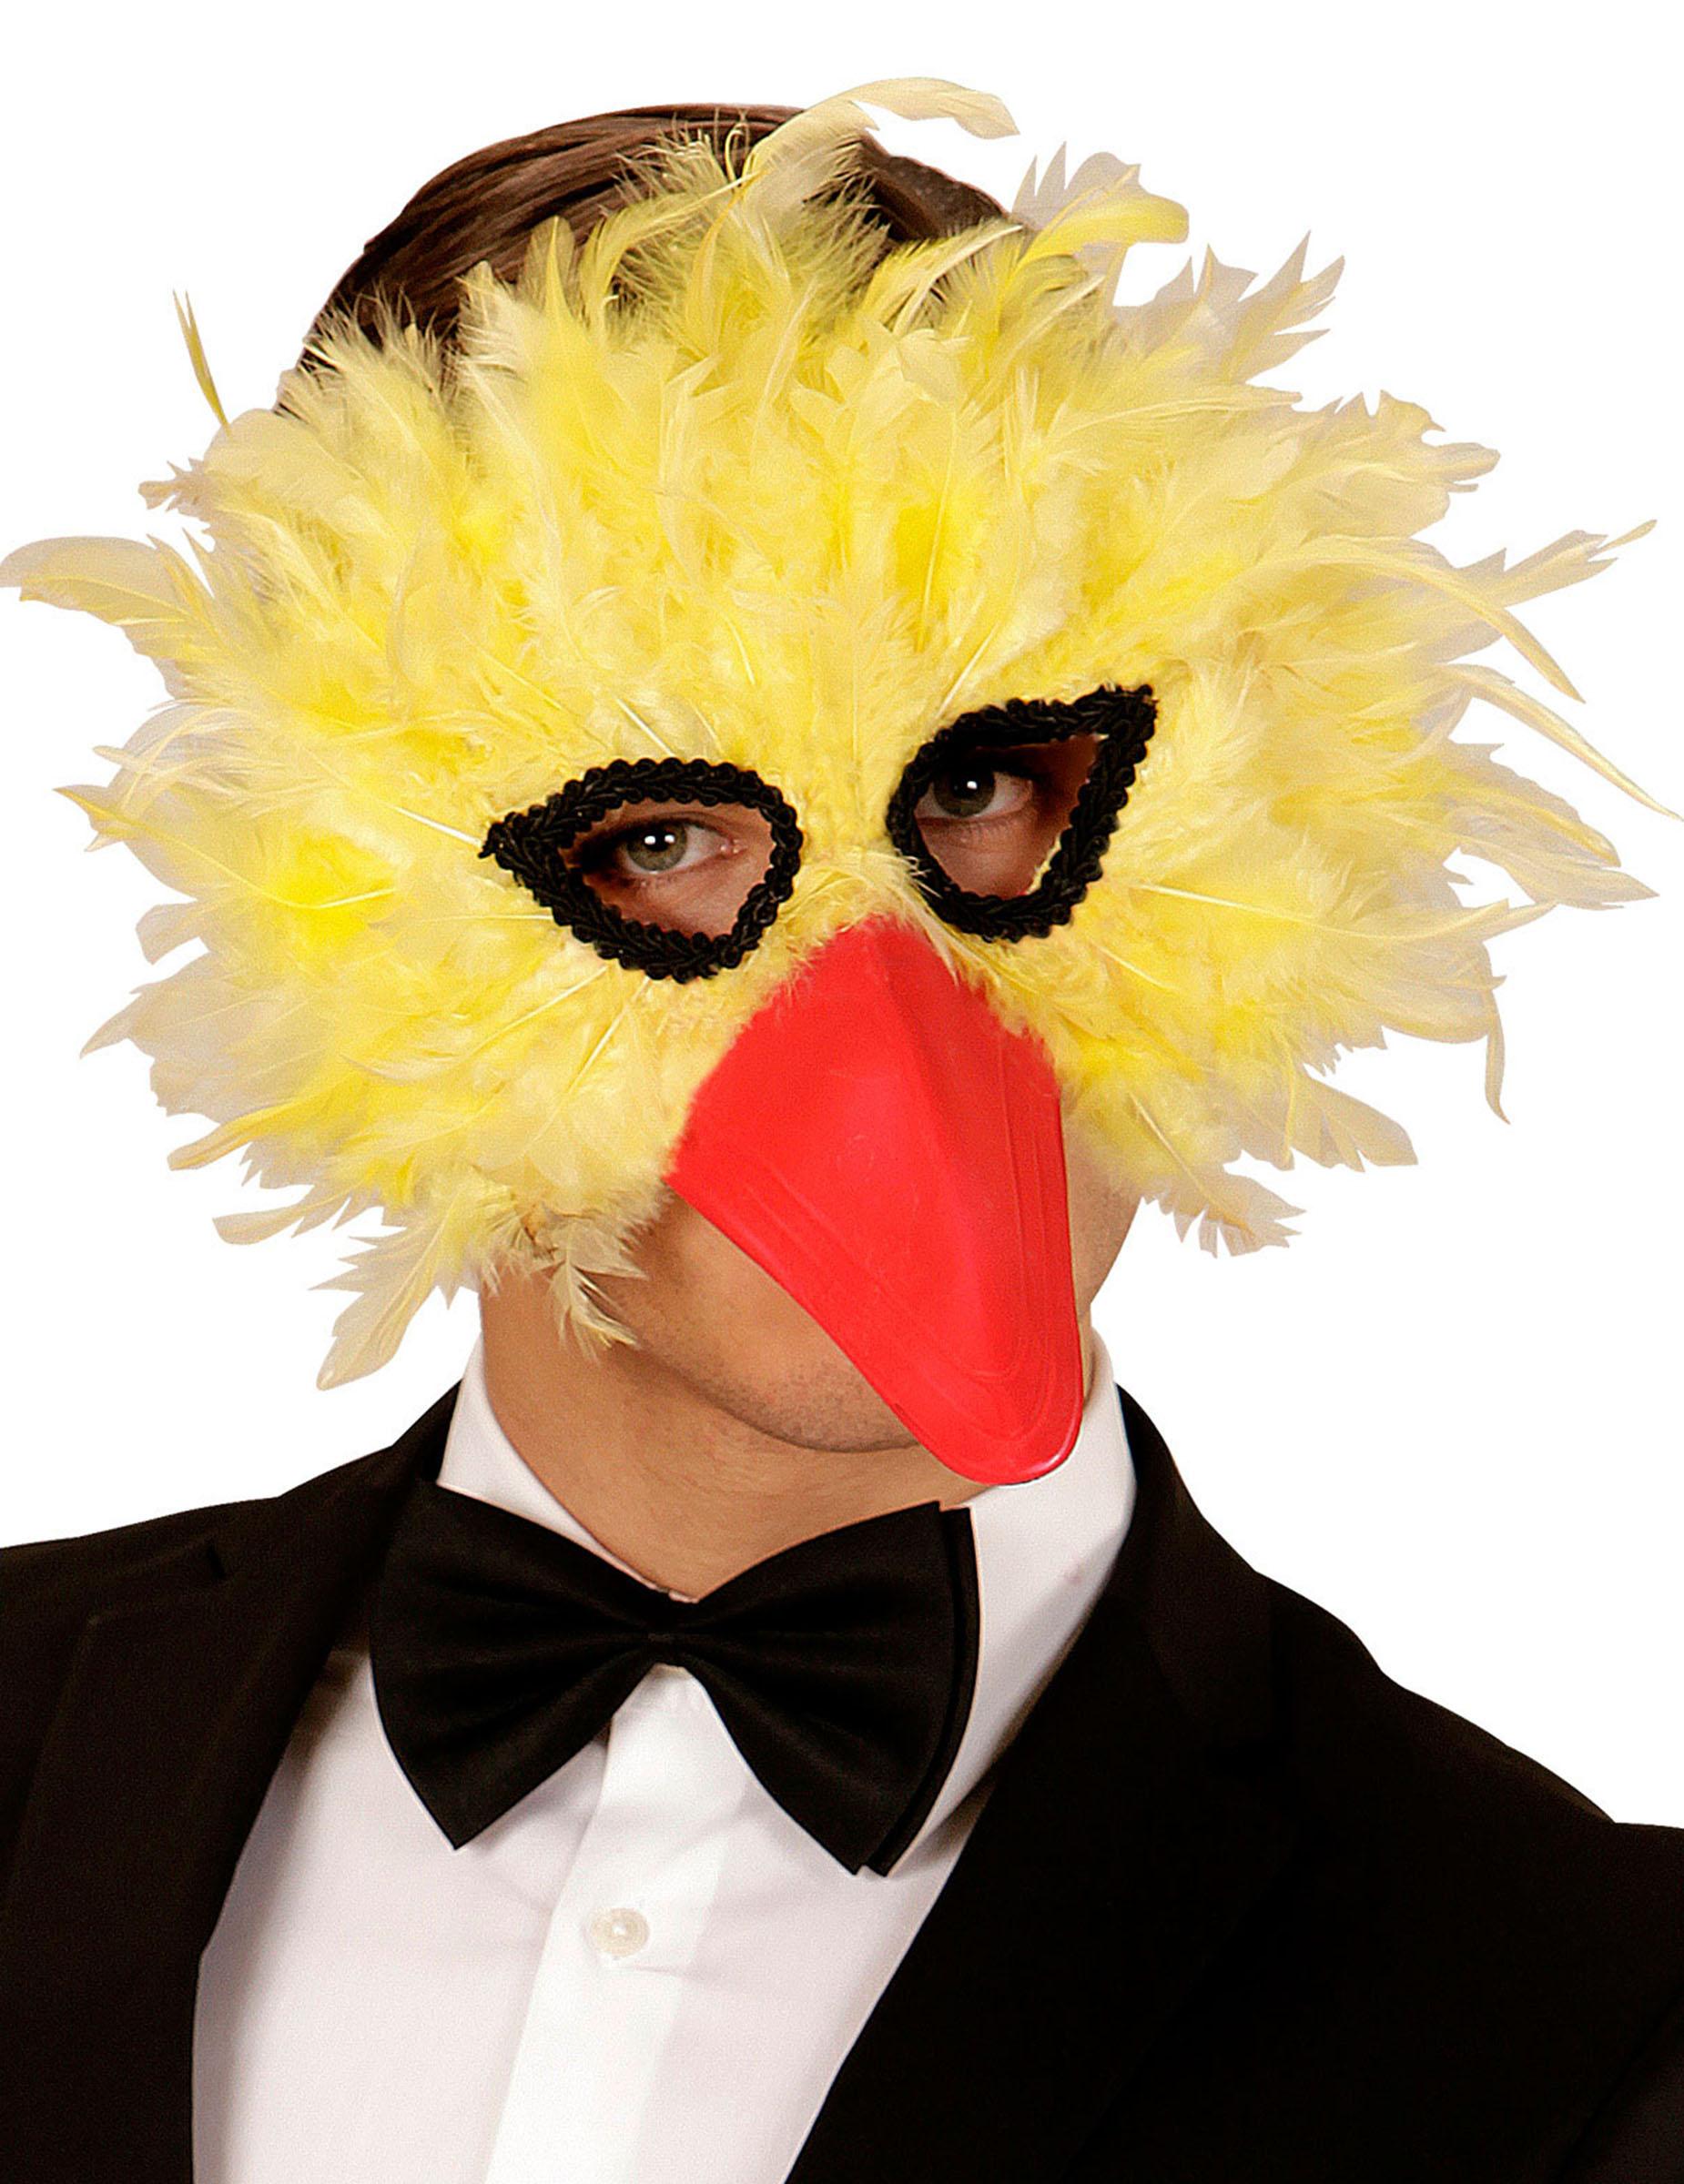 Beautiful Masque à plumes oiseau jaune adulte : Deguise-toi, achat de Masques UO32